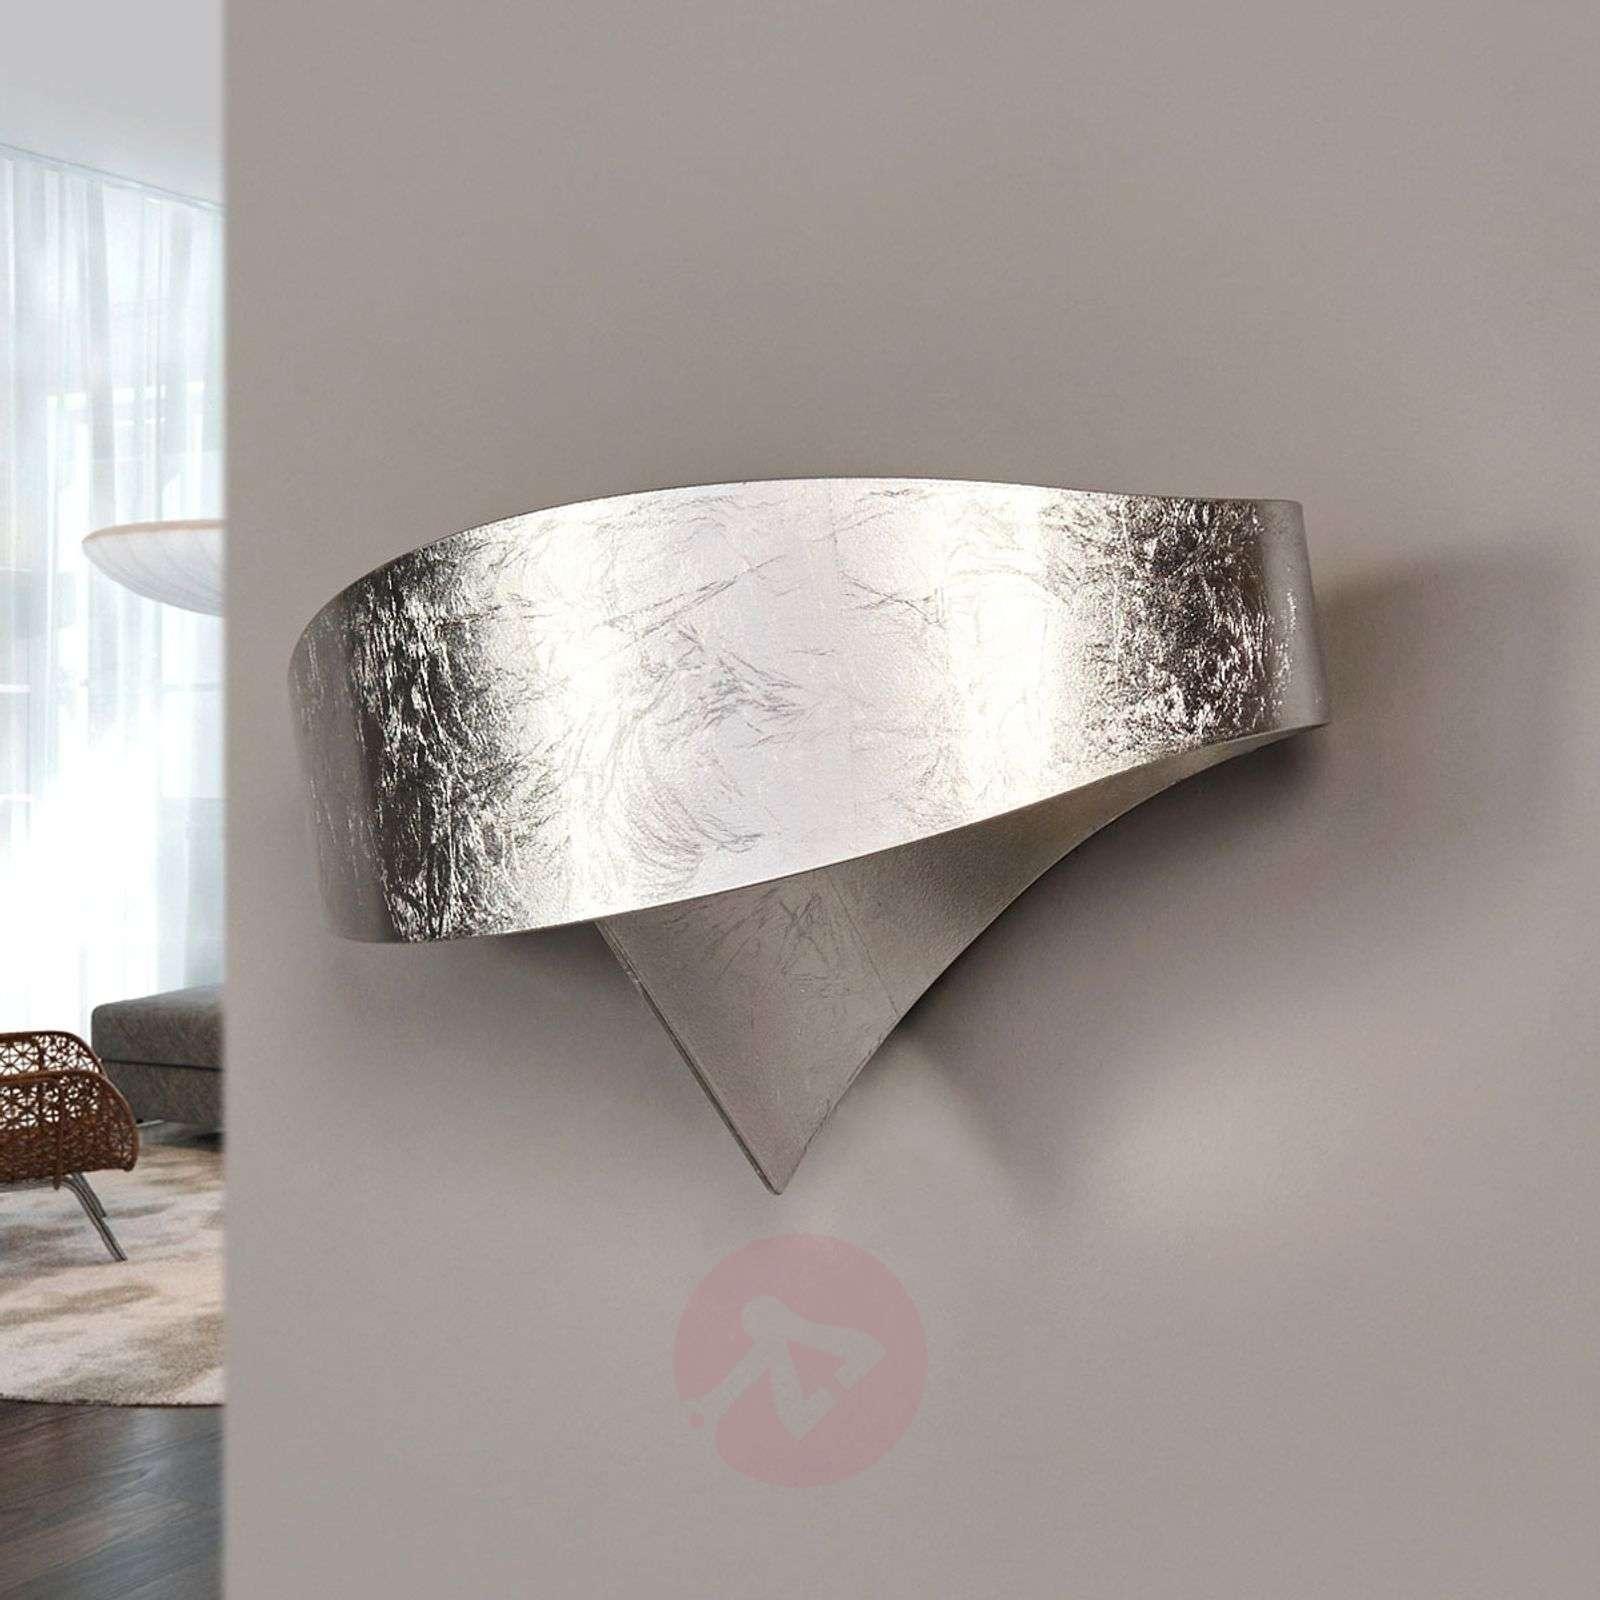 Hopeinen designer-seinävalaisin Scudo-8525698-01